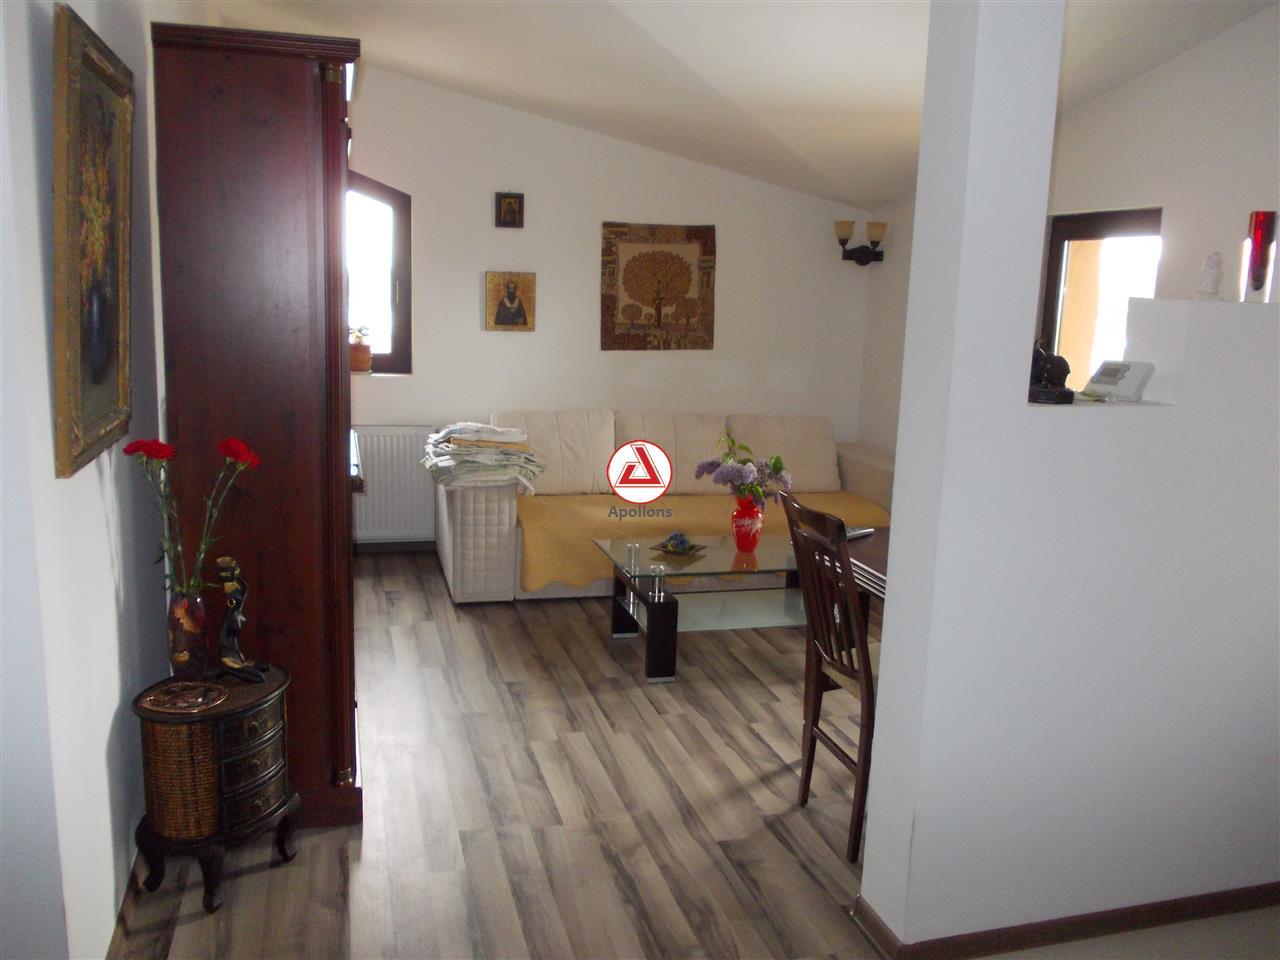 Vanzare vila de lux in Ploiesti, zona Gheorghe Doja